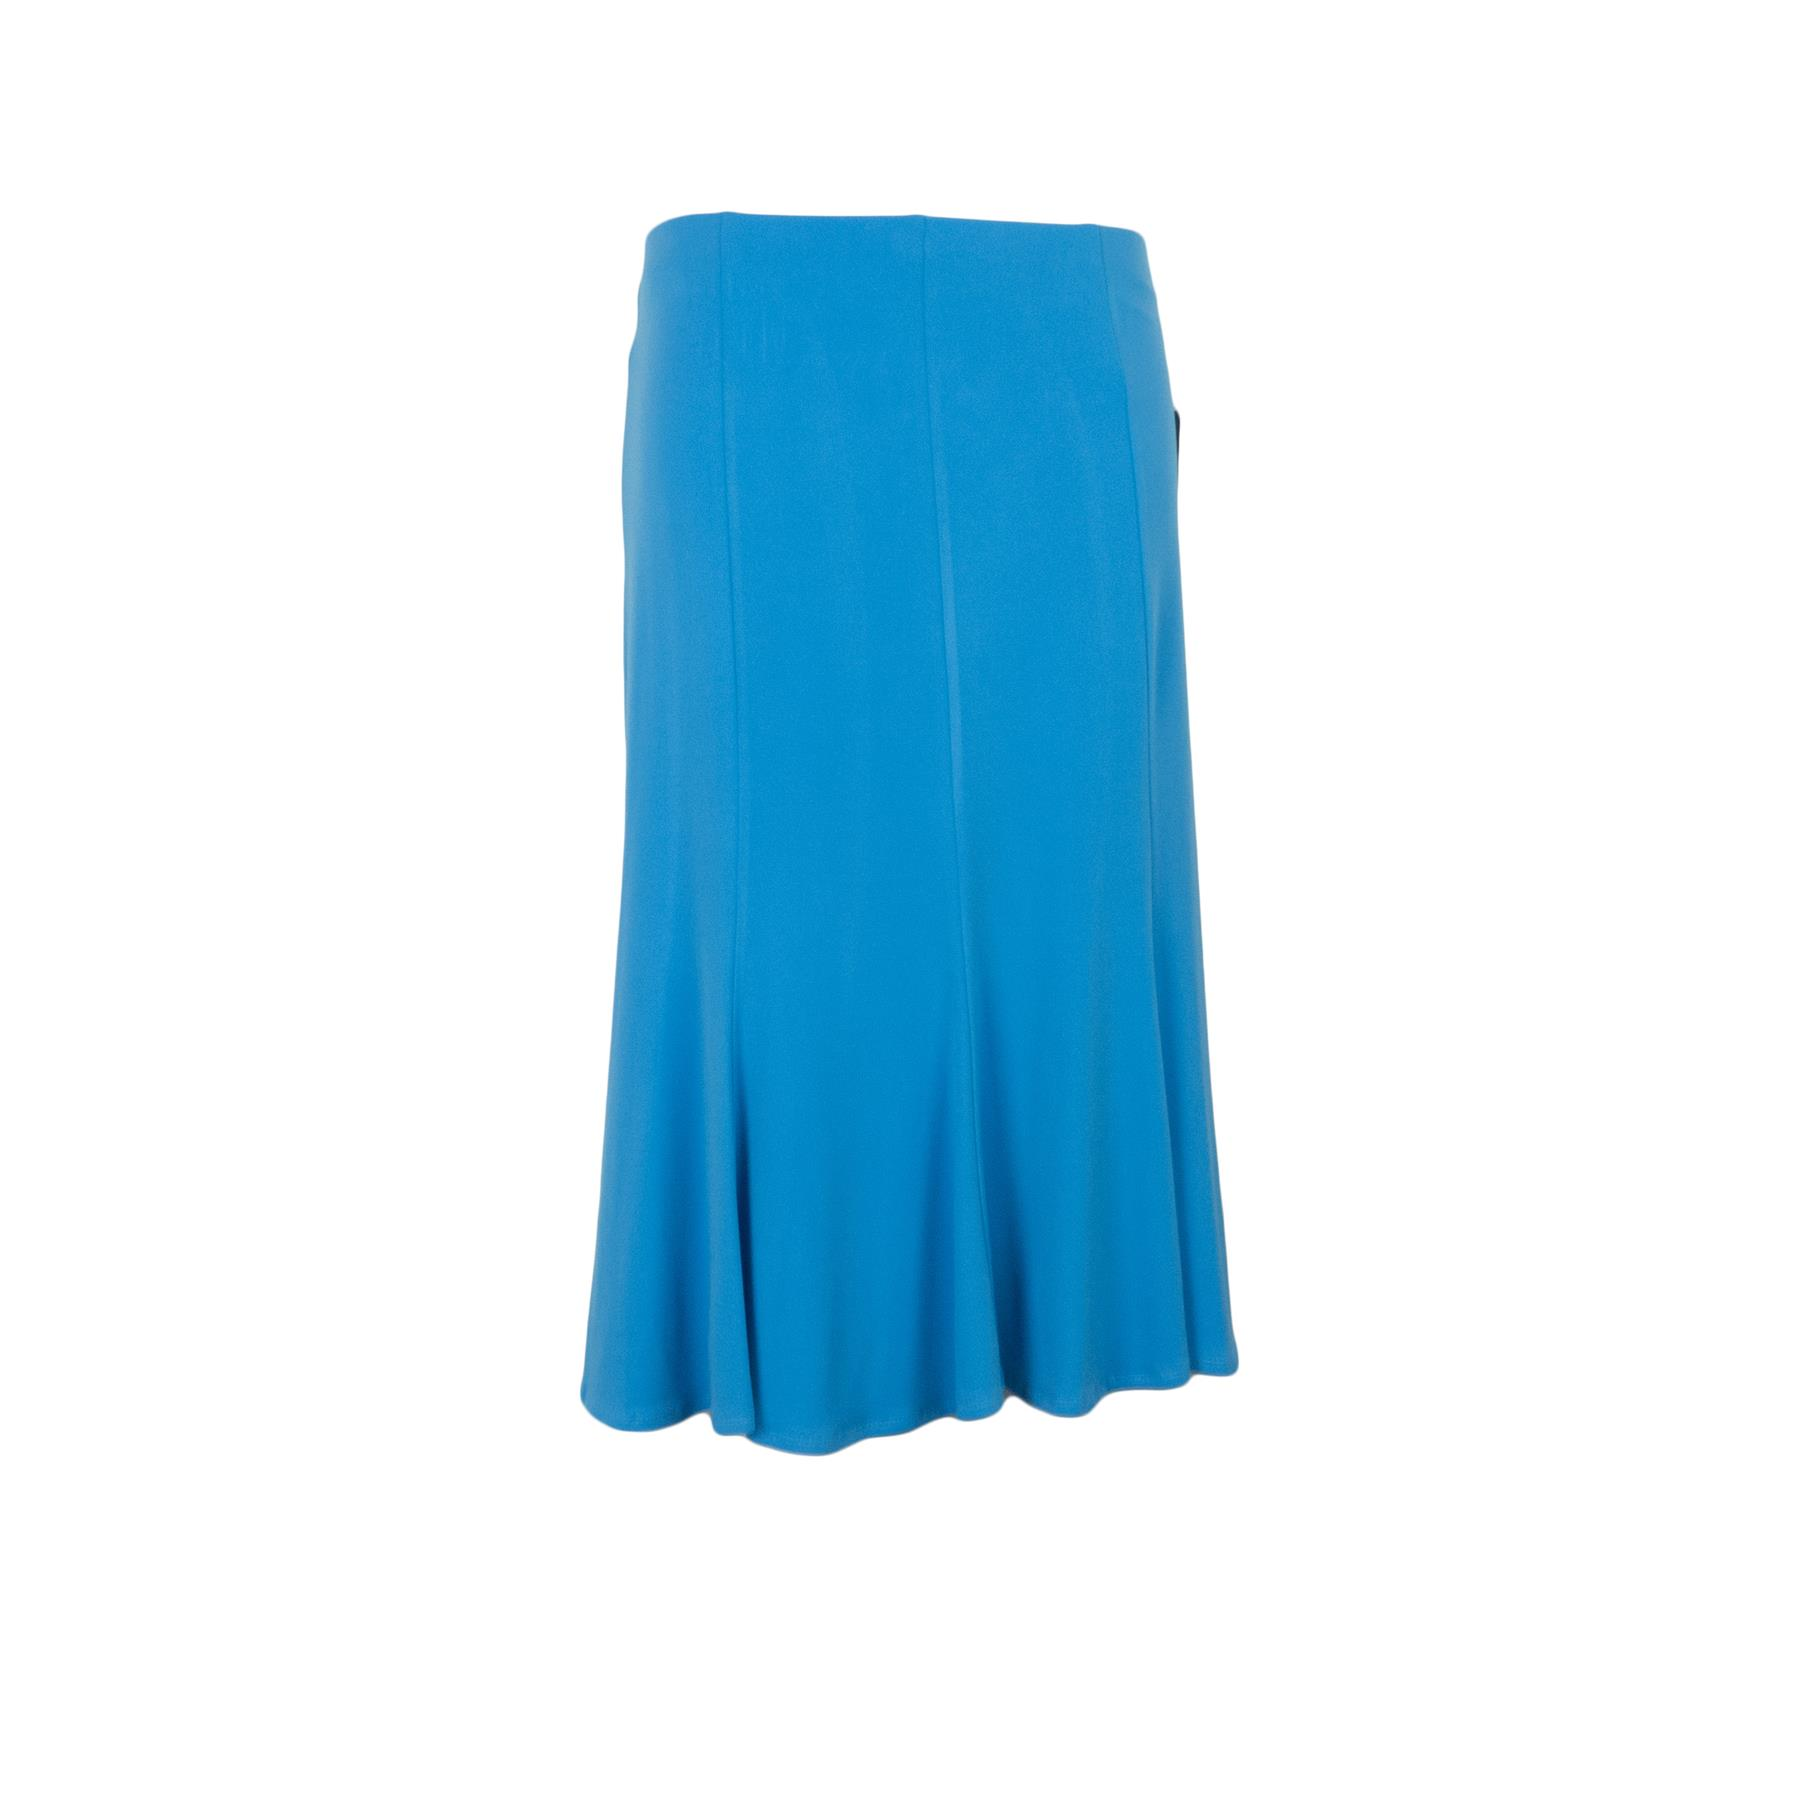 Saloos Classic Women/'s Layered Aqua Summer Dress Sizes UK 12-22